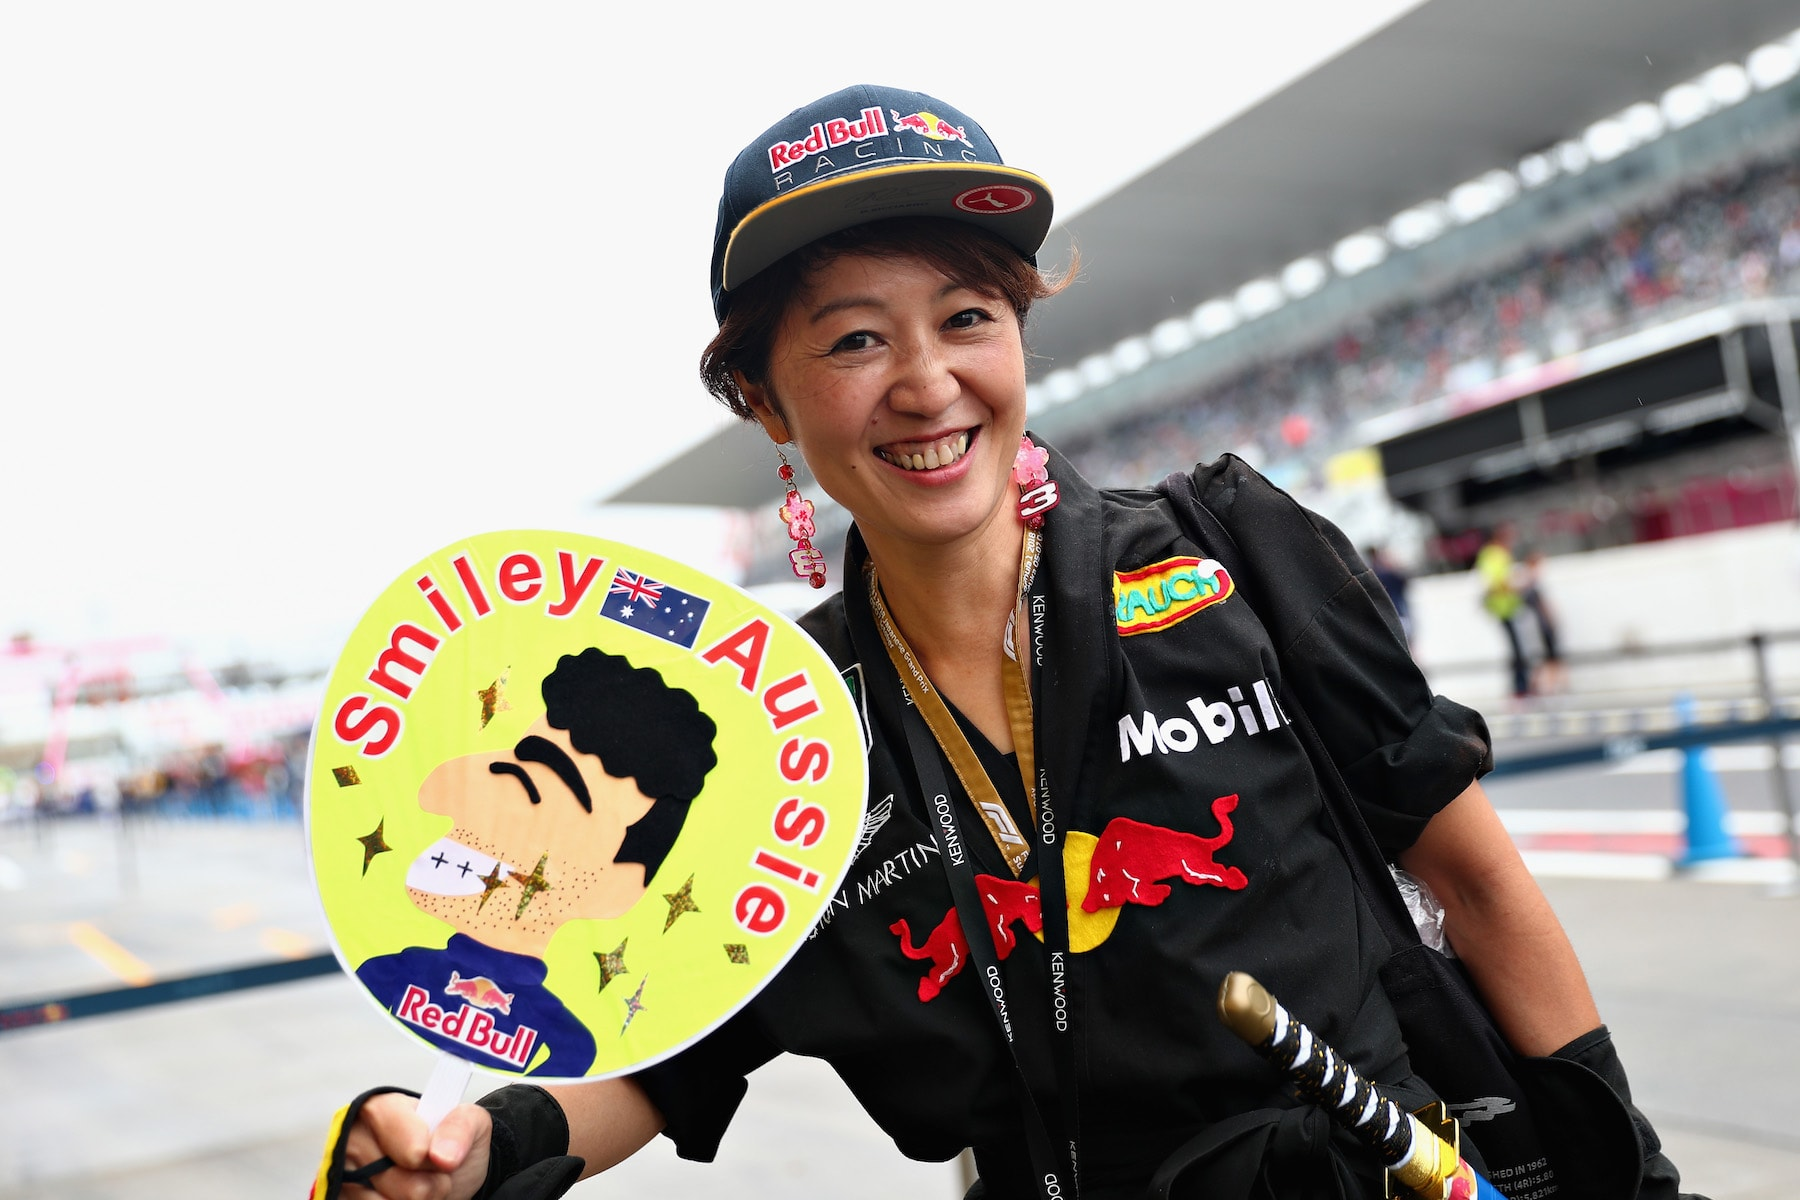 2018 Red Bull fans | 2018 Japanese GP 2 copy.jpg